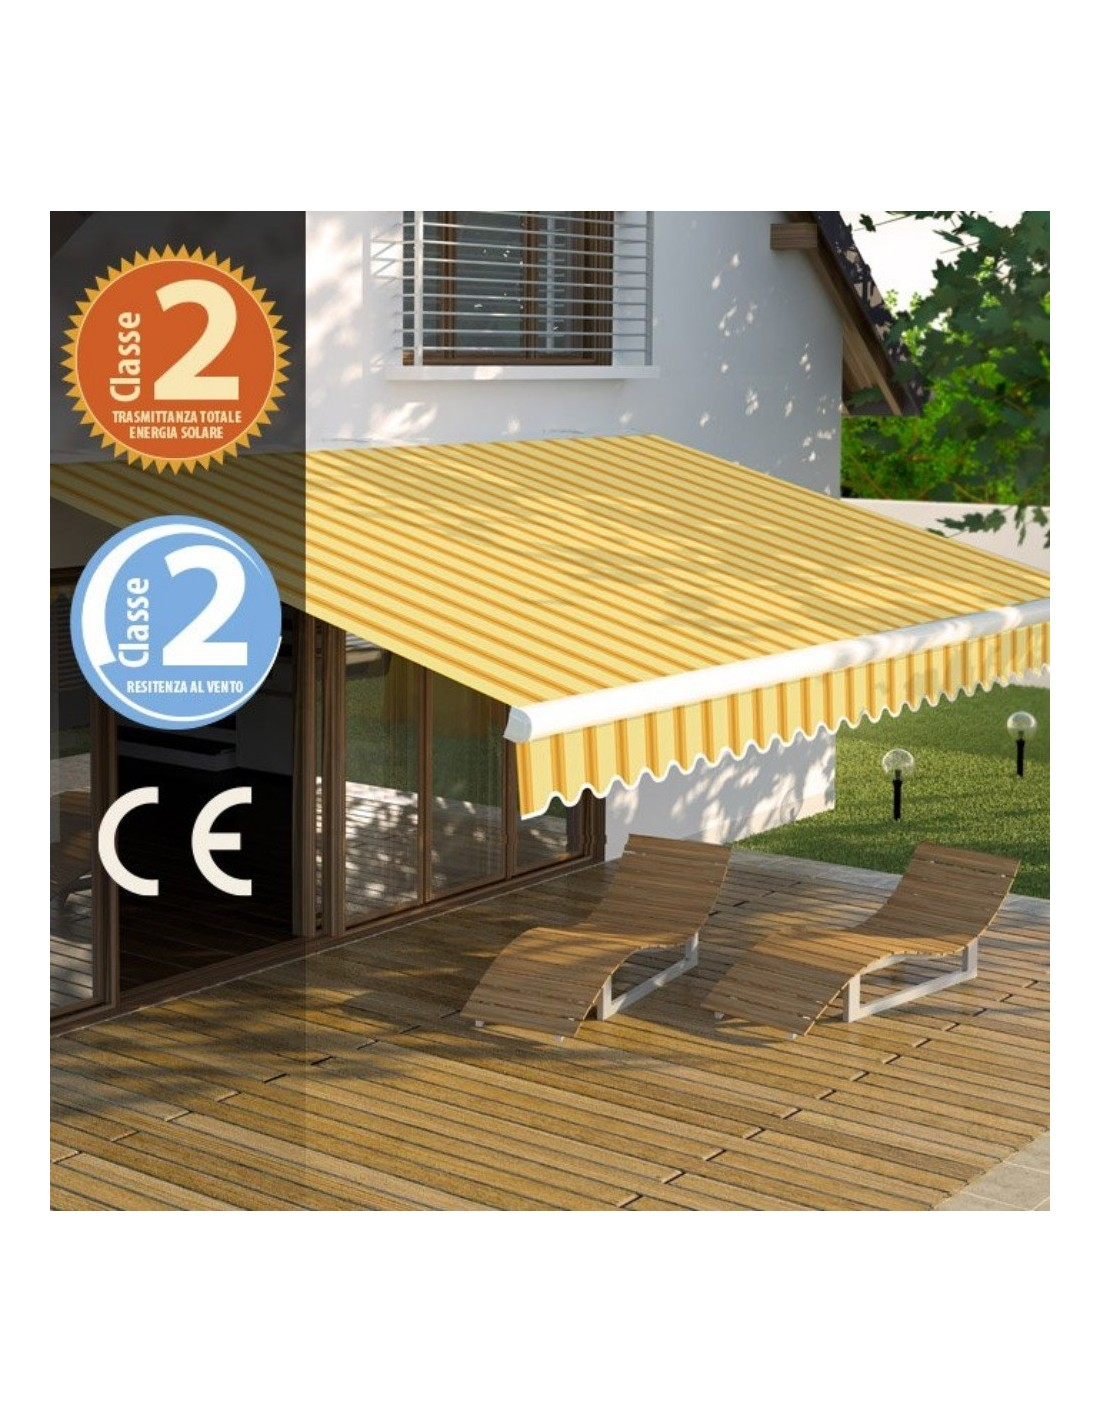 Tende Da Sole Frattamaggiore tenda da sole fissa itaca 3 x 2 metri colore beige e ocra verdelook a soli  159,00 €